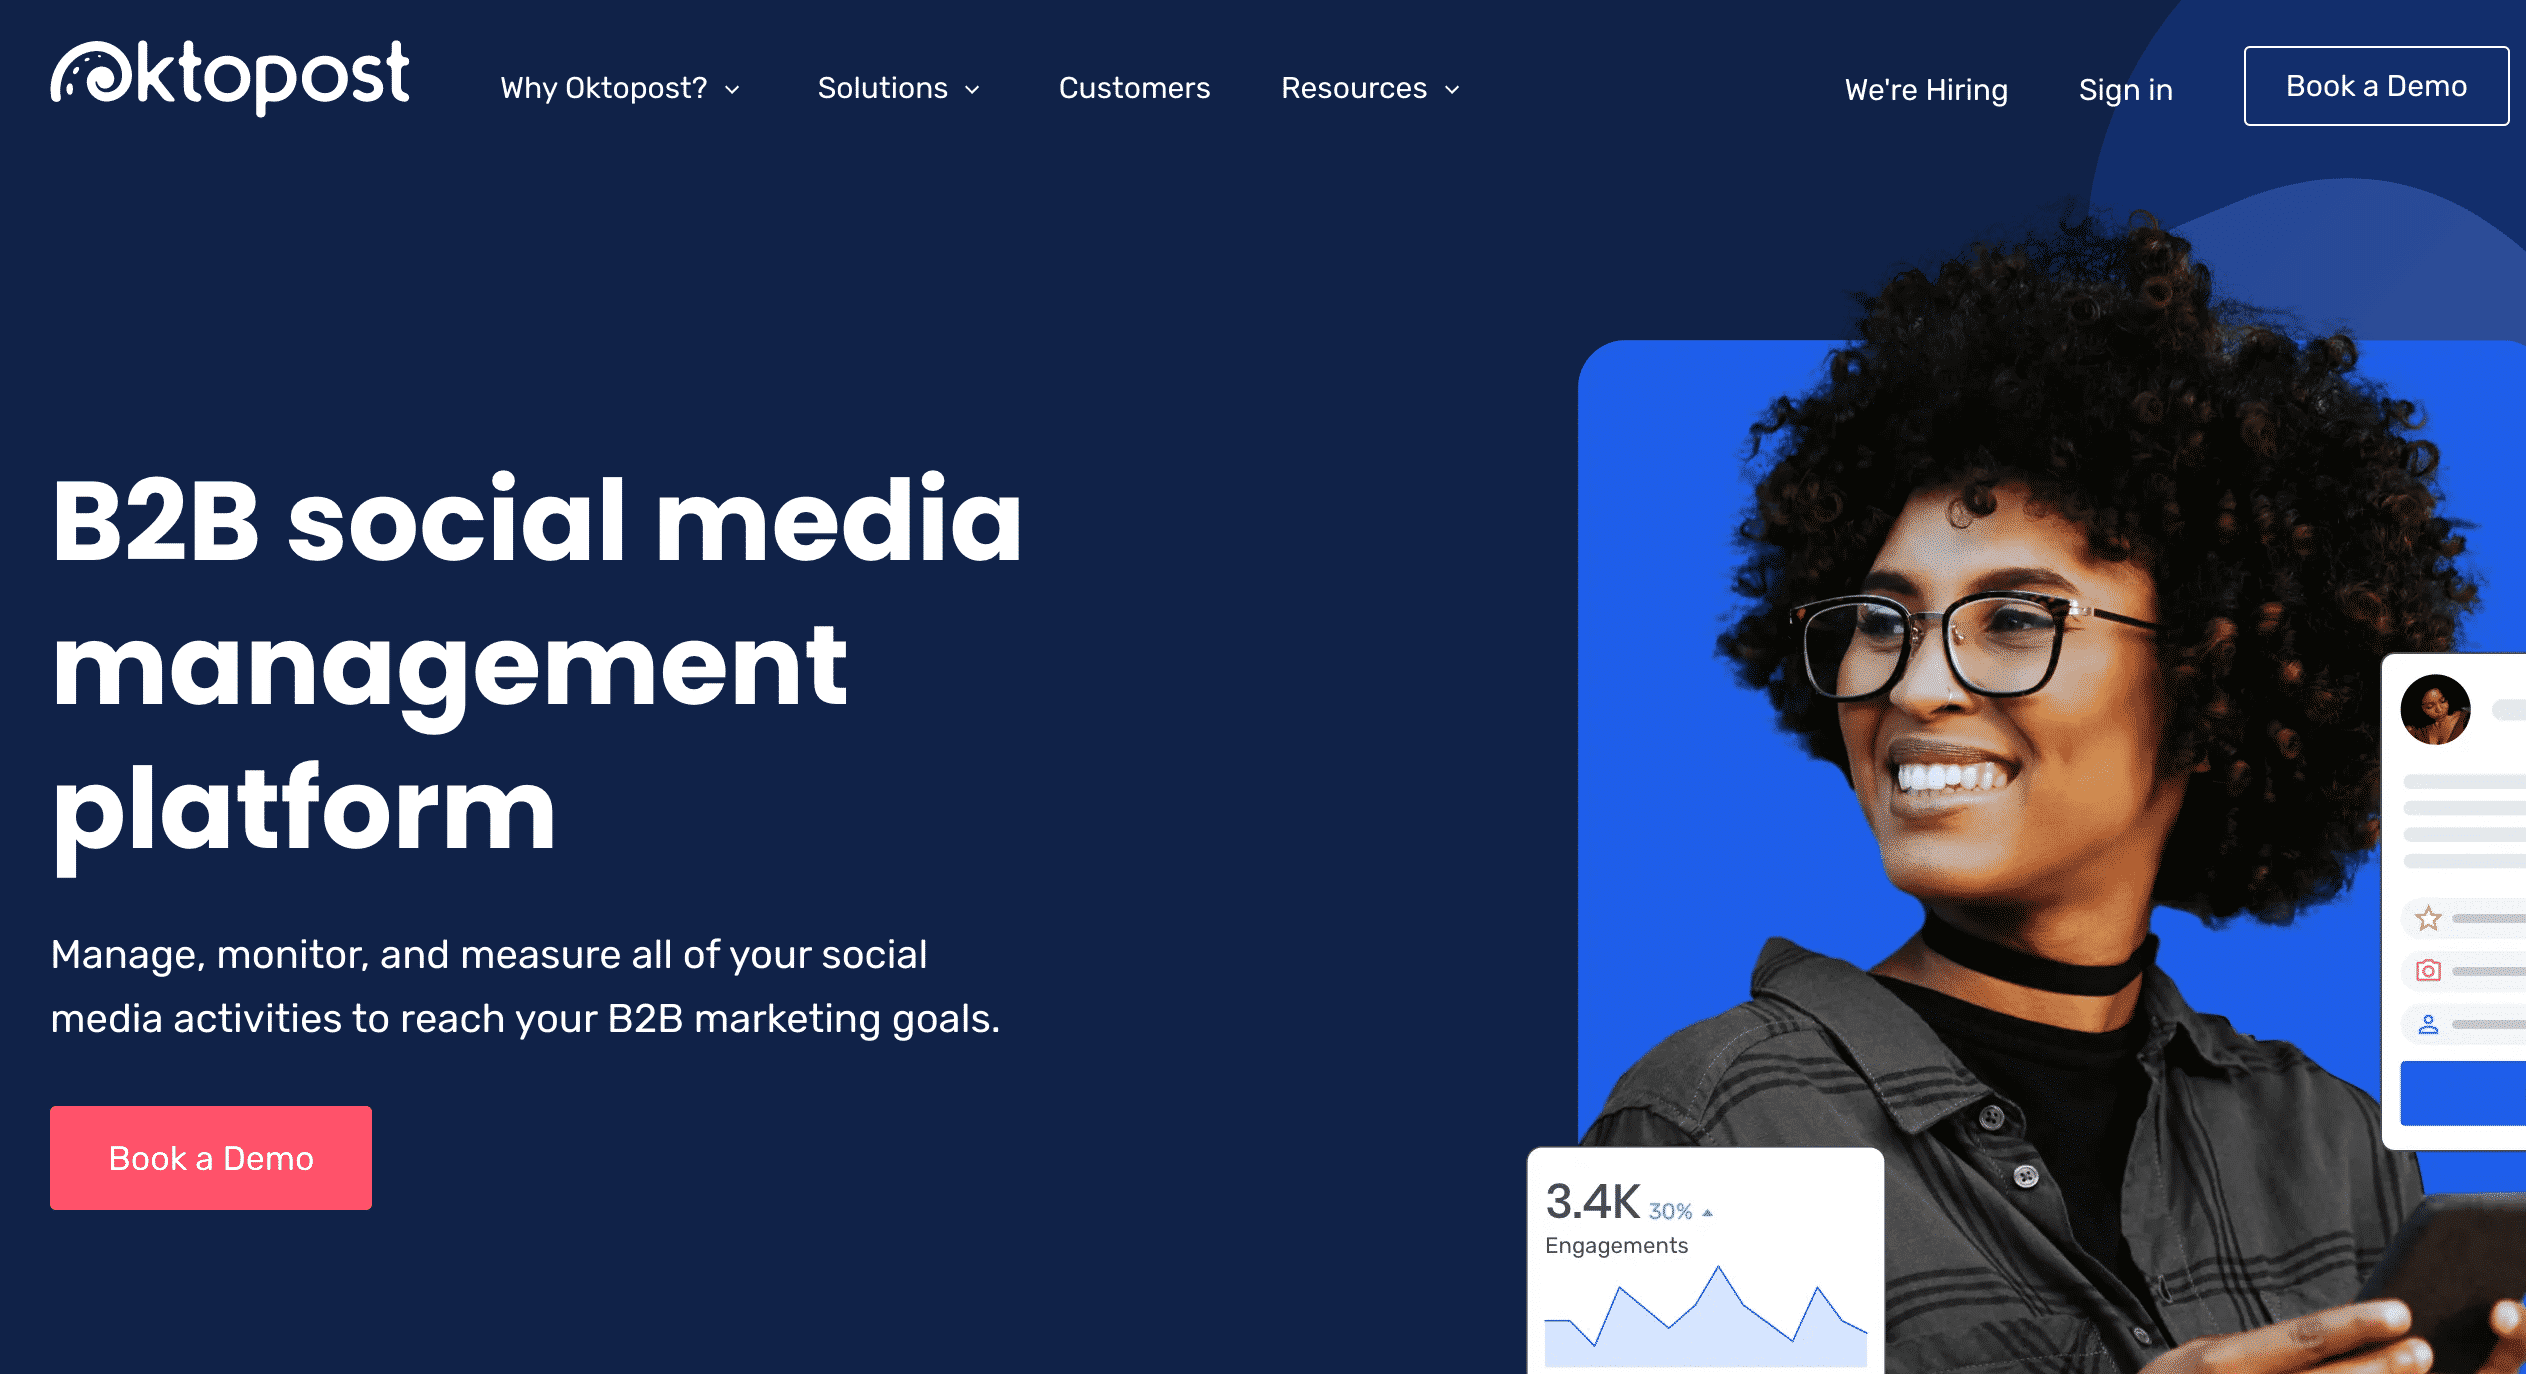 Oktopost B2B social media managment platform